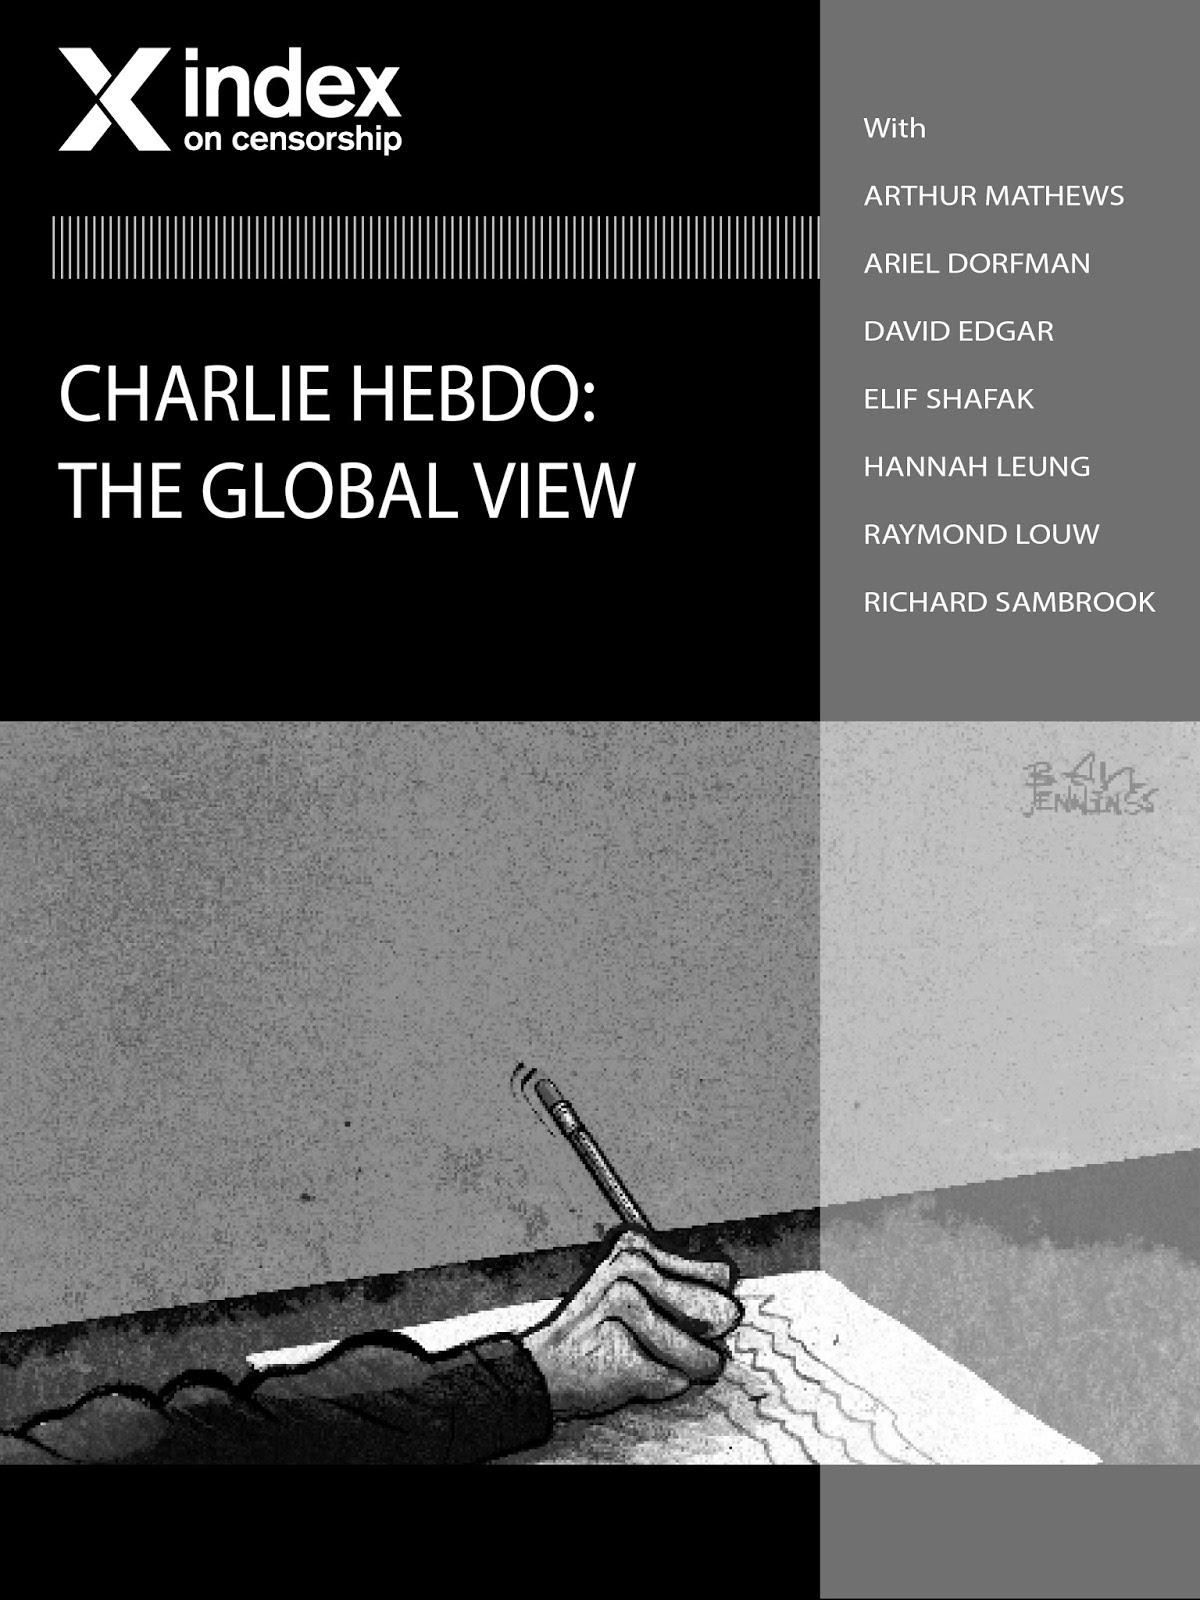 Bado S Blog Index On Censorship Charlie Hebdo The Global View